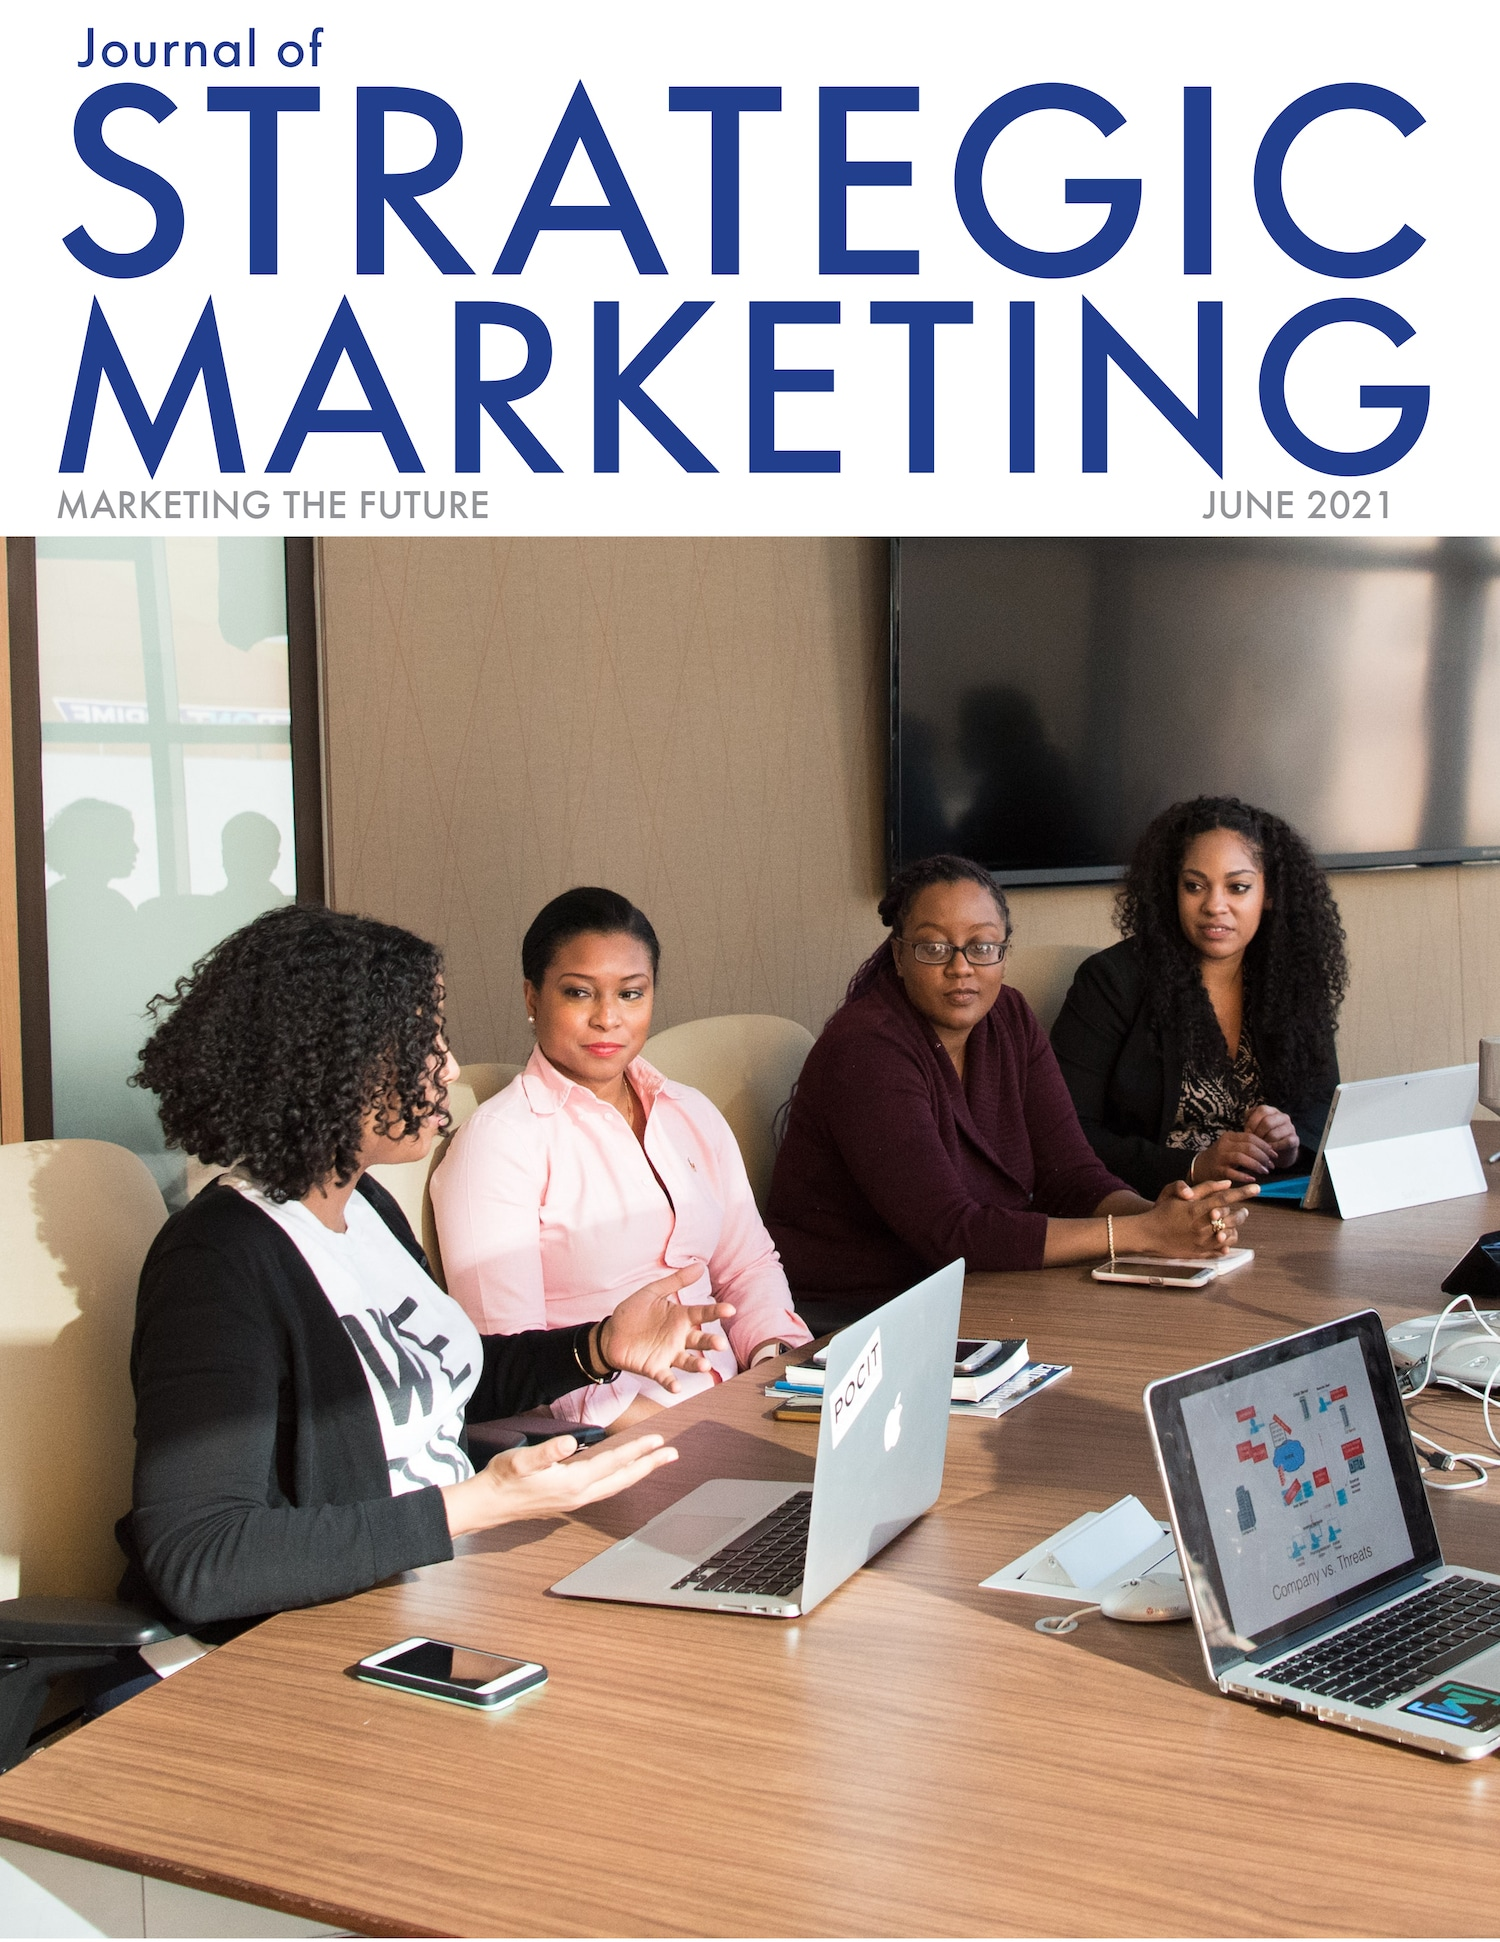 Strategic marketing - Cover image